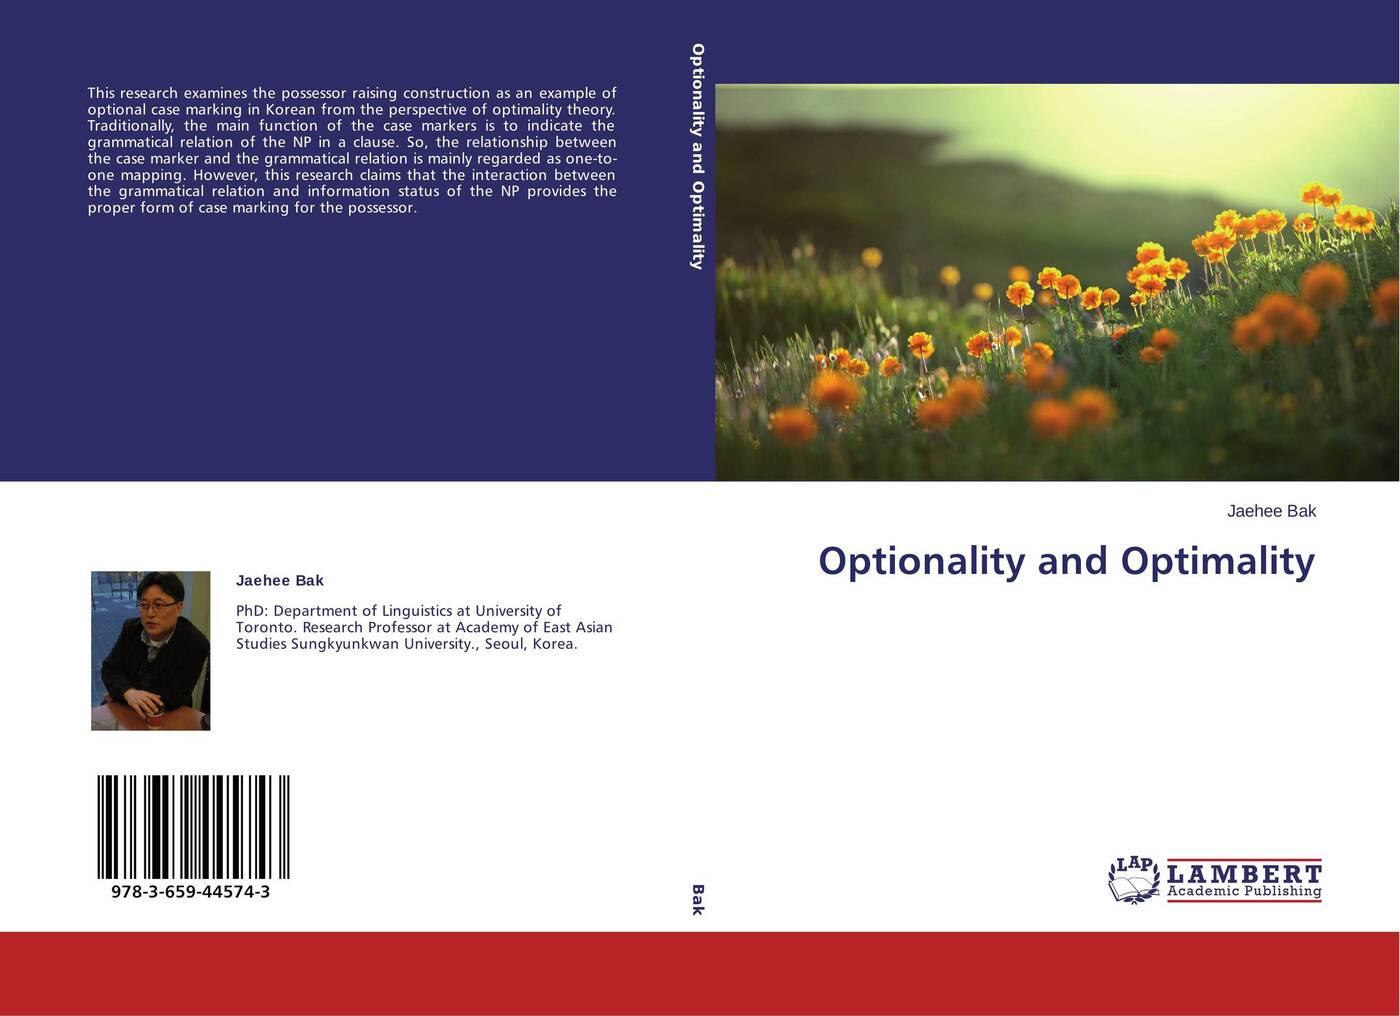 Jaehee Bak Optionality and Optimality